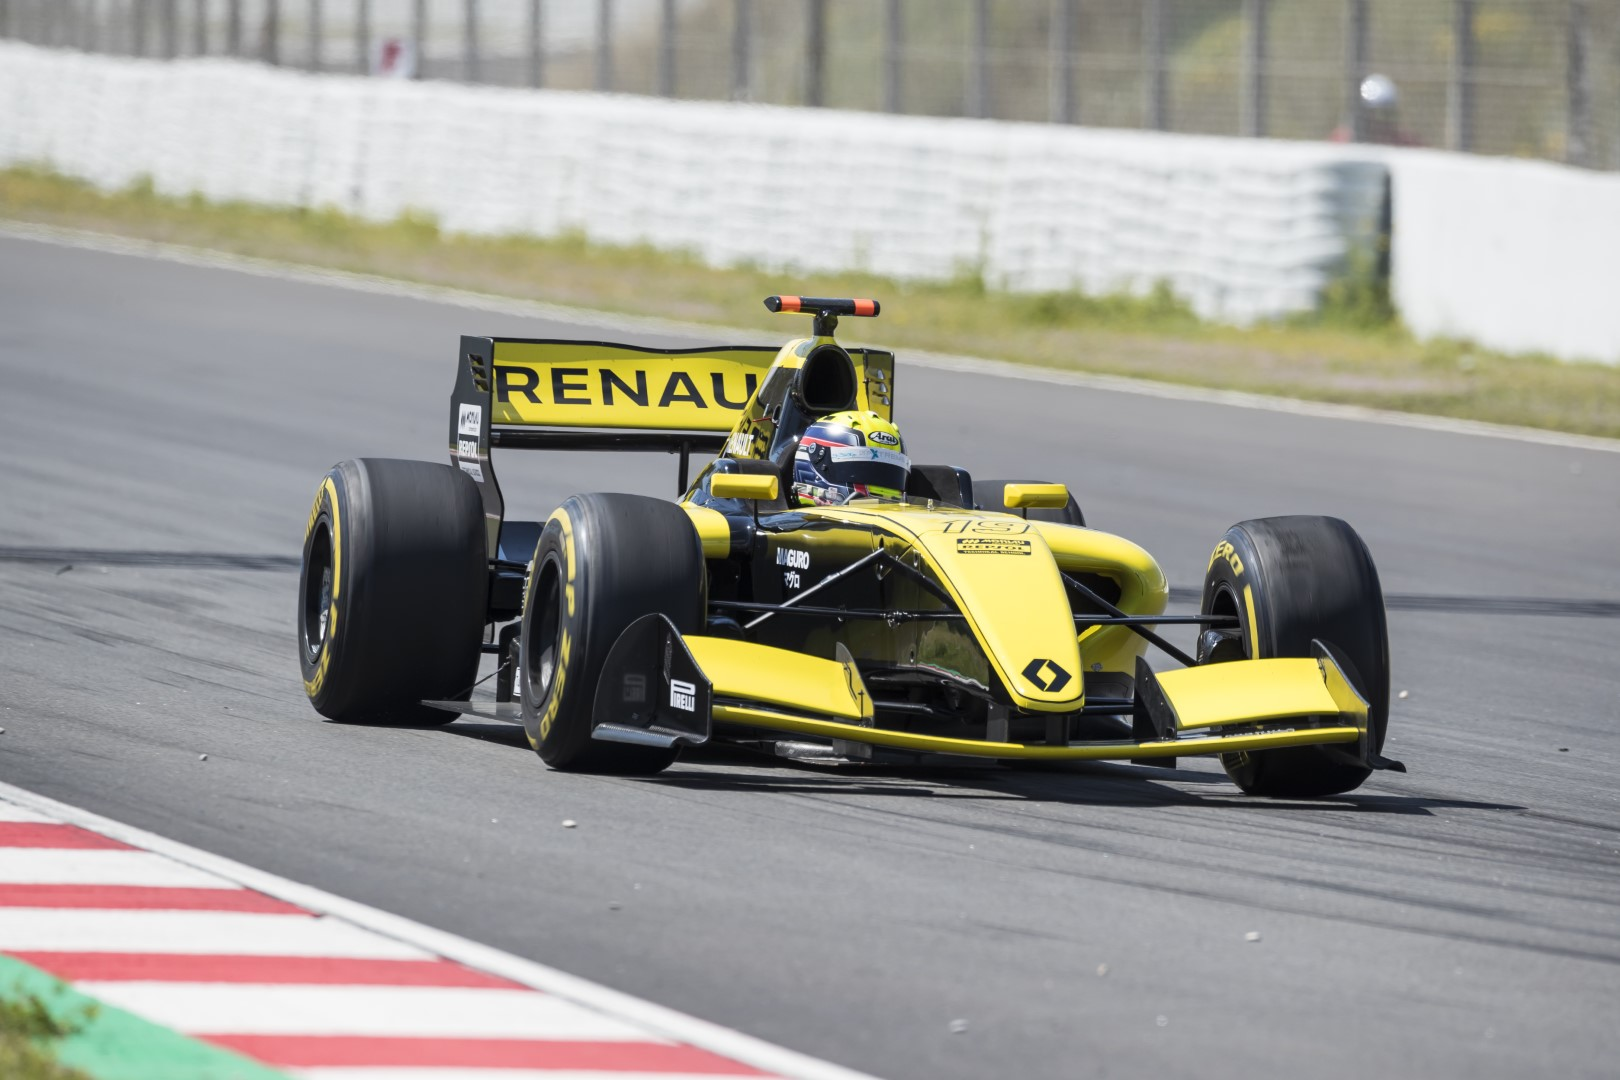 Formula V8 Driving Experience_AK2I0521 (Grande)